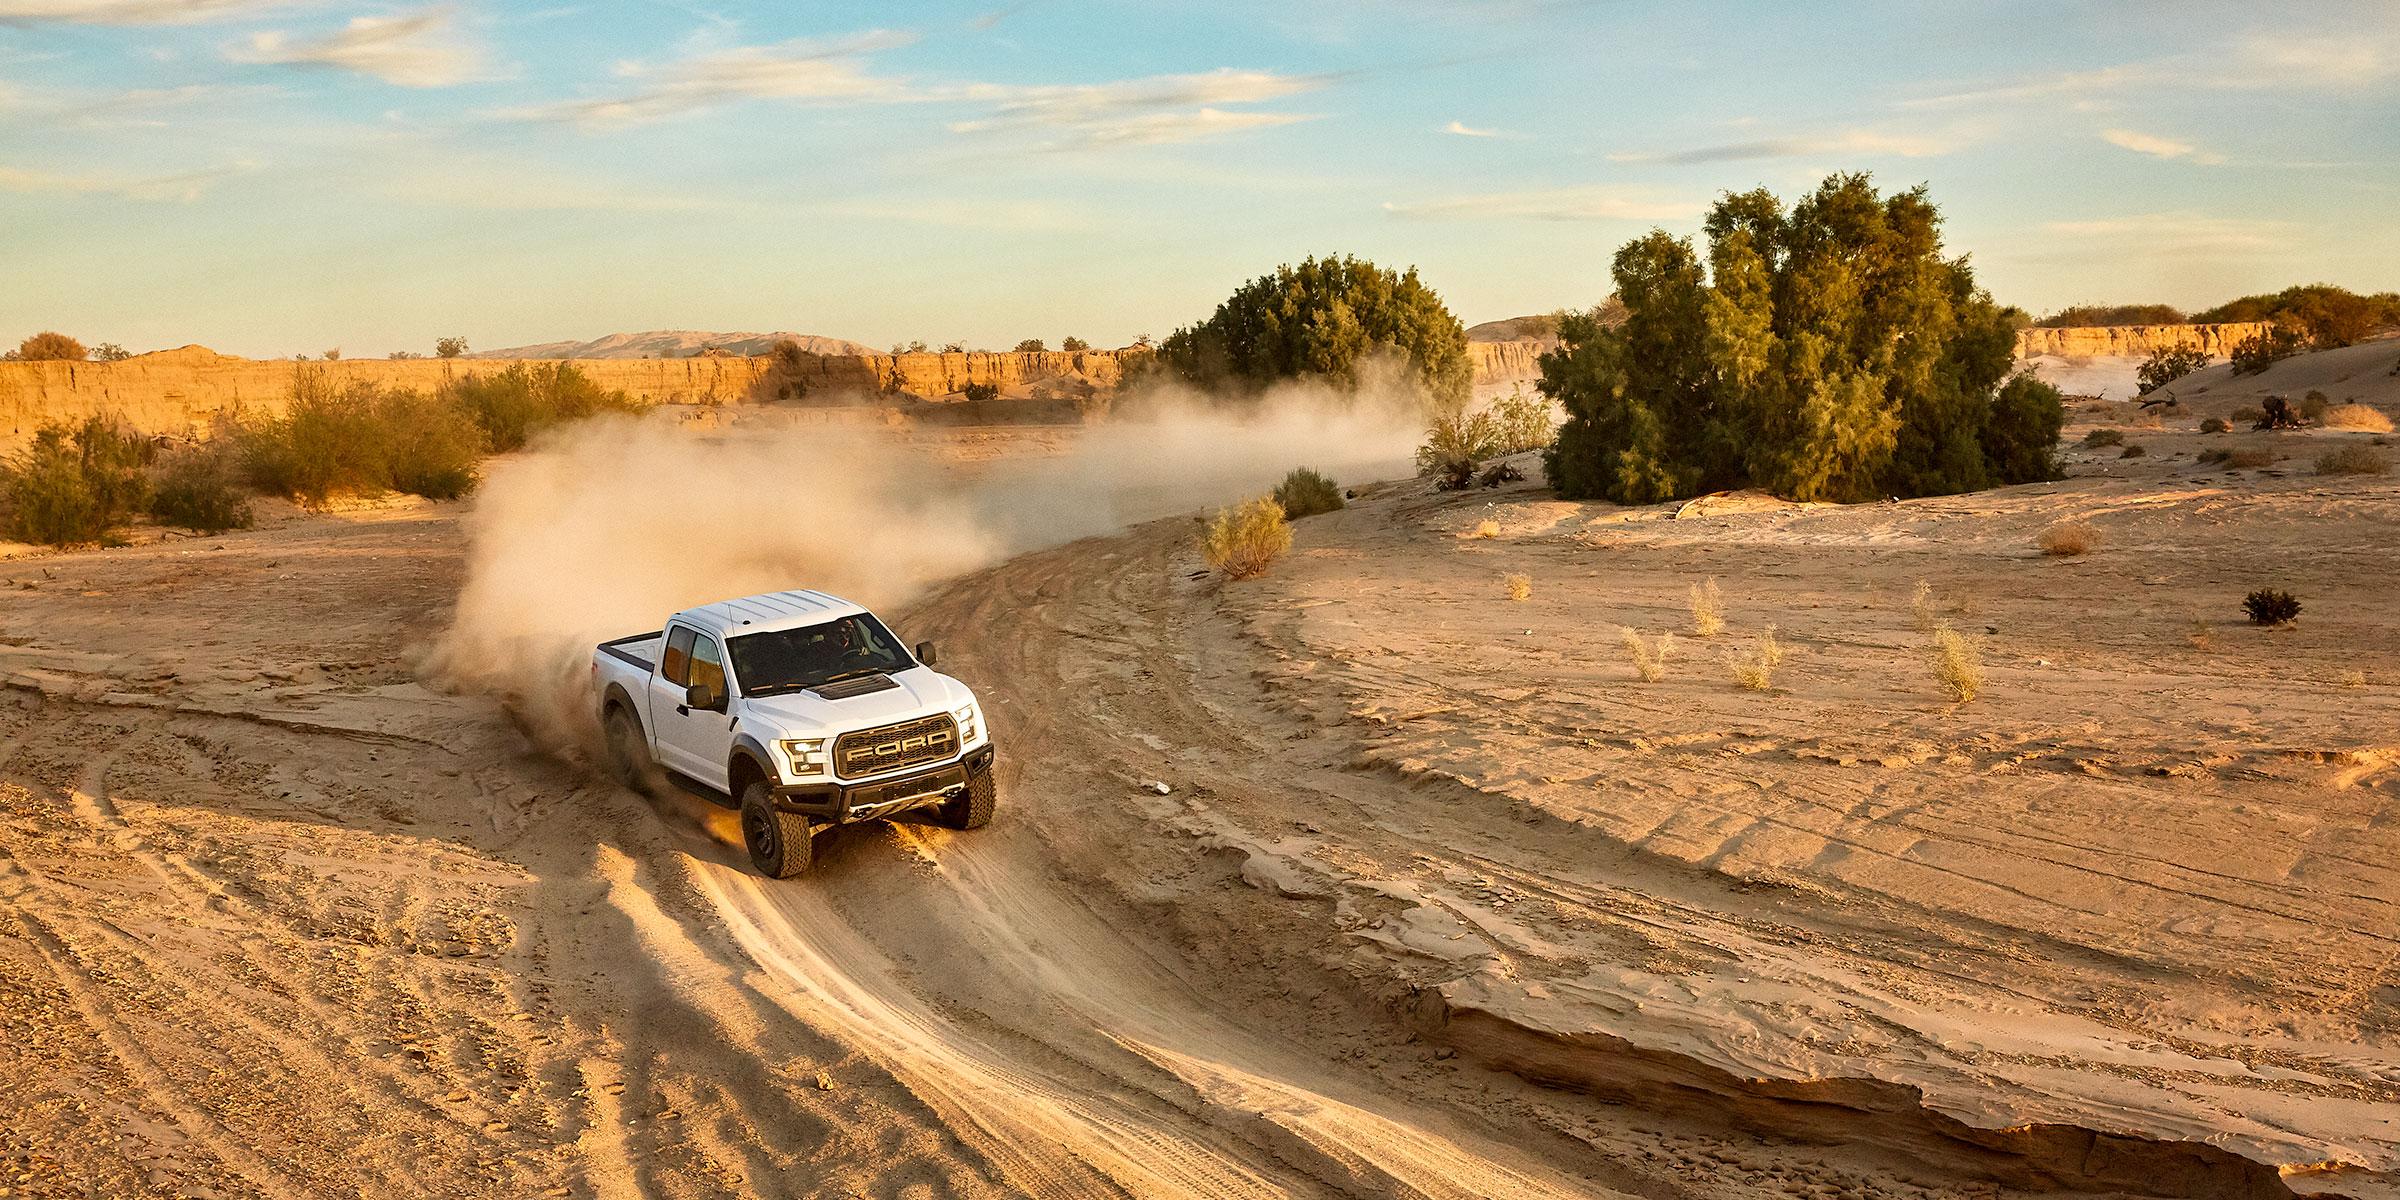 austin-trigg-southern-california-White-raptor-ford-truck-desert-sunset-anza-borrego-dust-driving.jpg